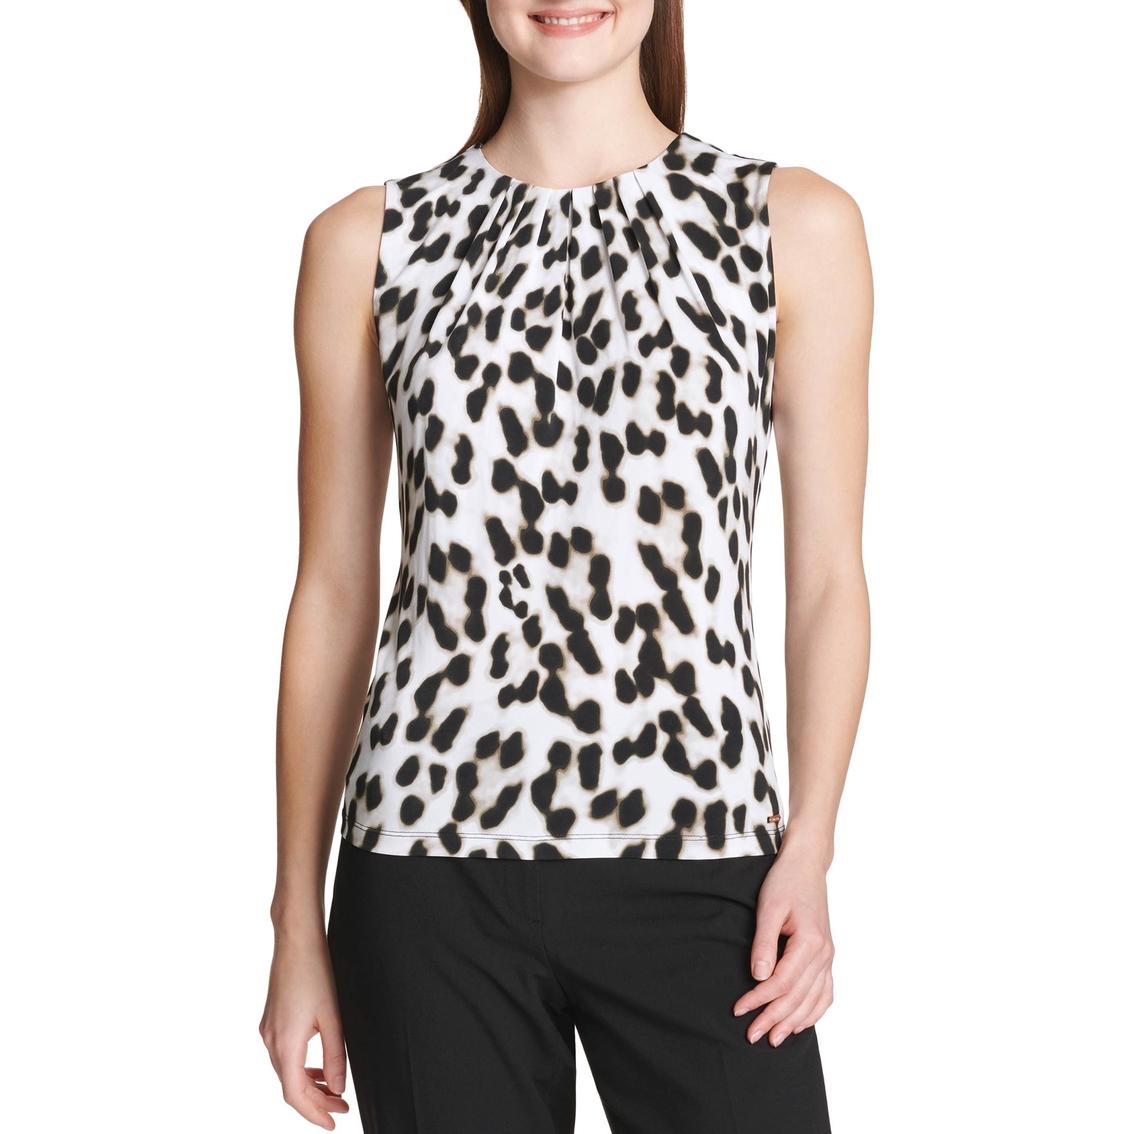 ab454bce6aa3 Calvin Klein Collection Animal Print Top   Blouses & Tunics ...